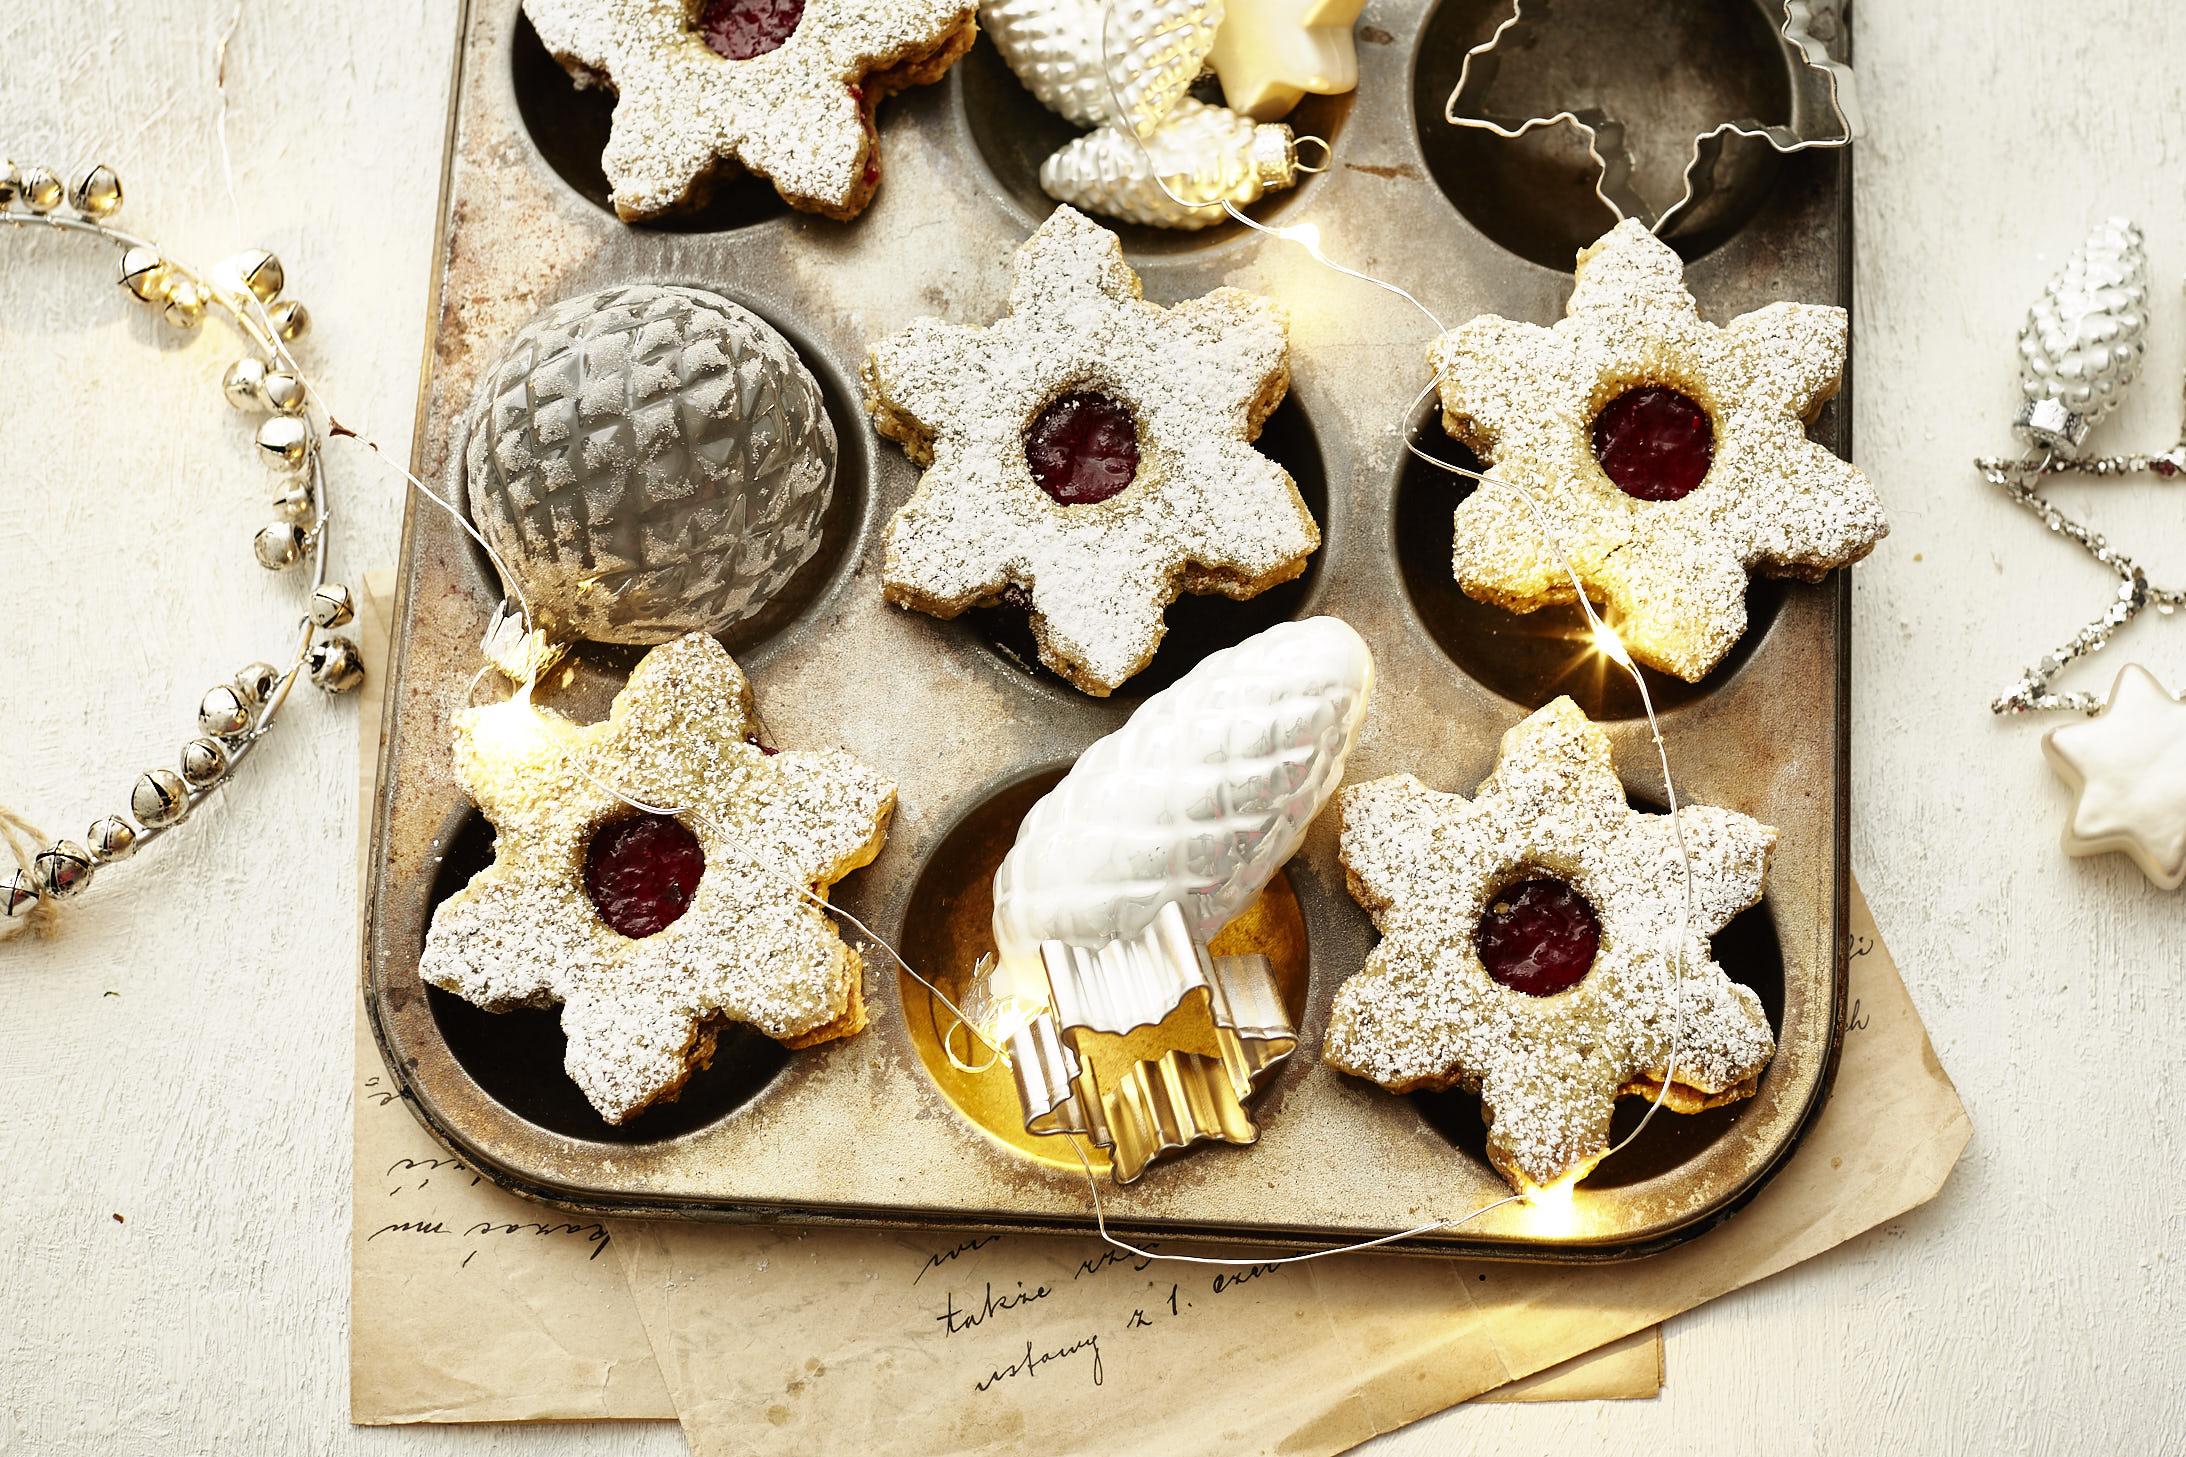 kürbiskern-matcha-pistazien-kekse- 2